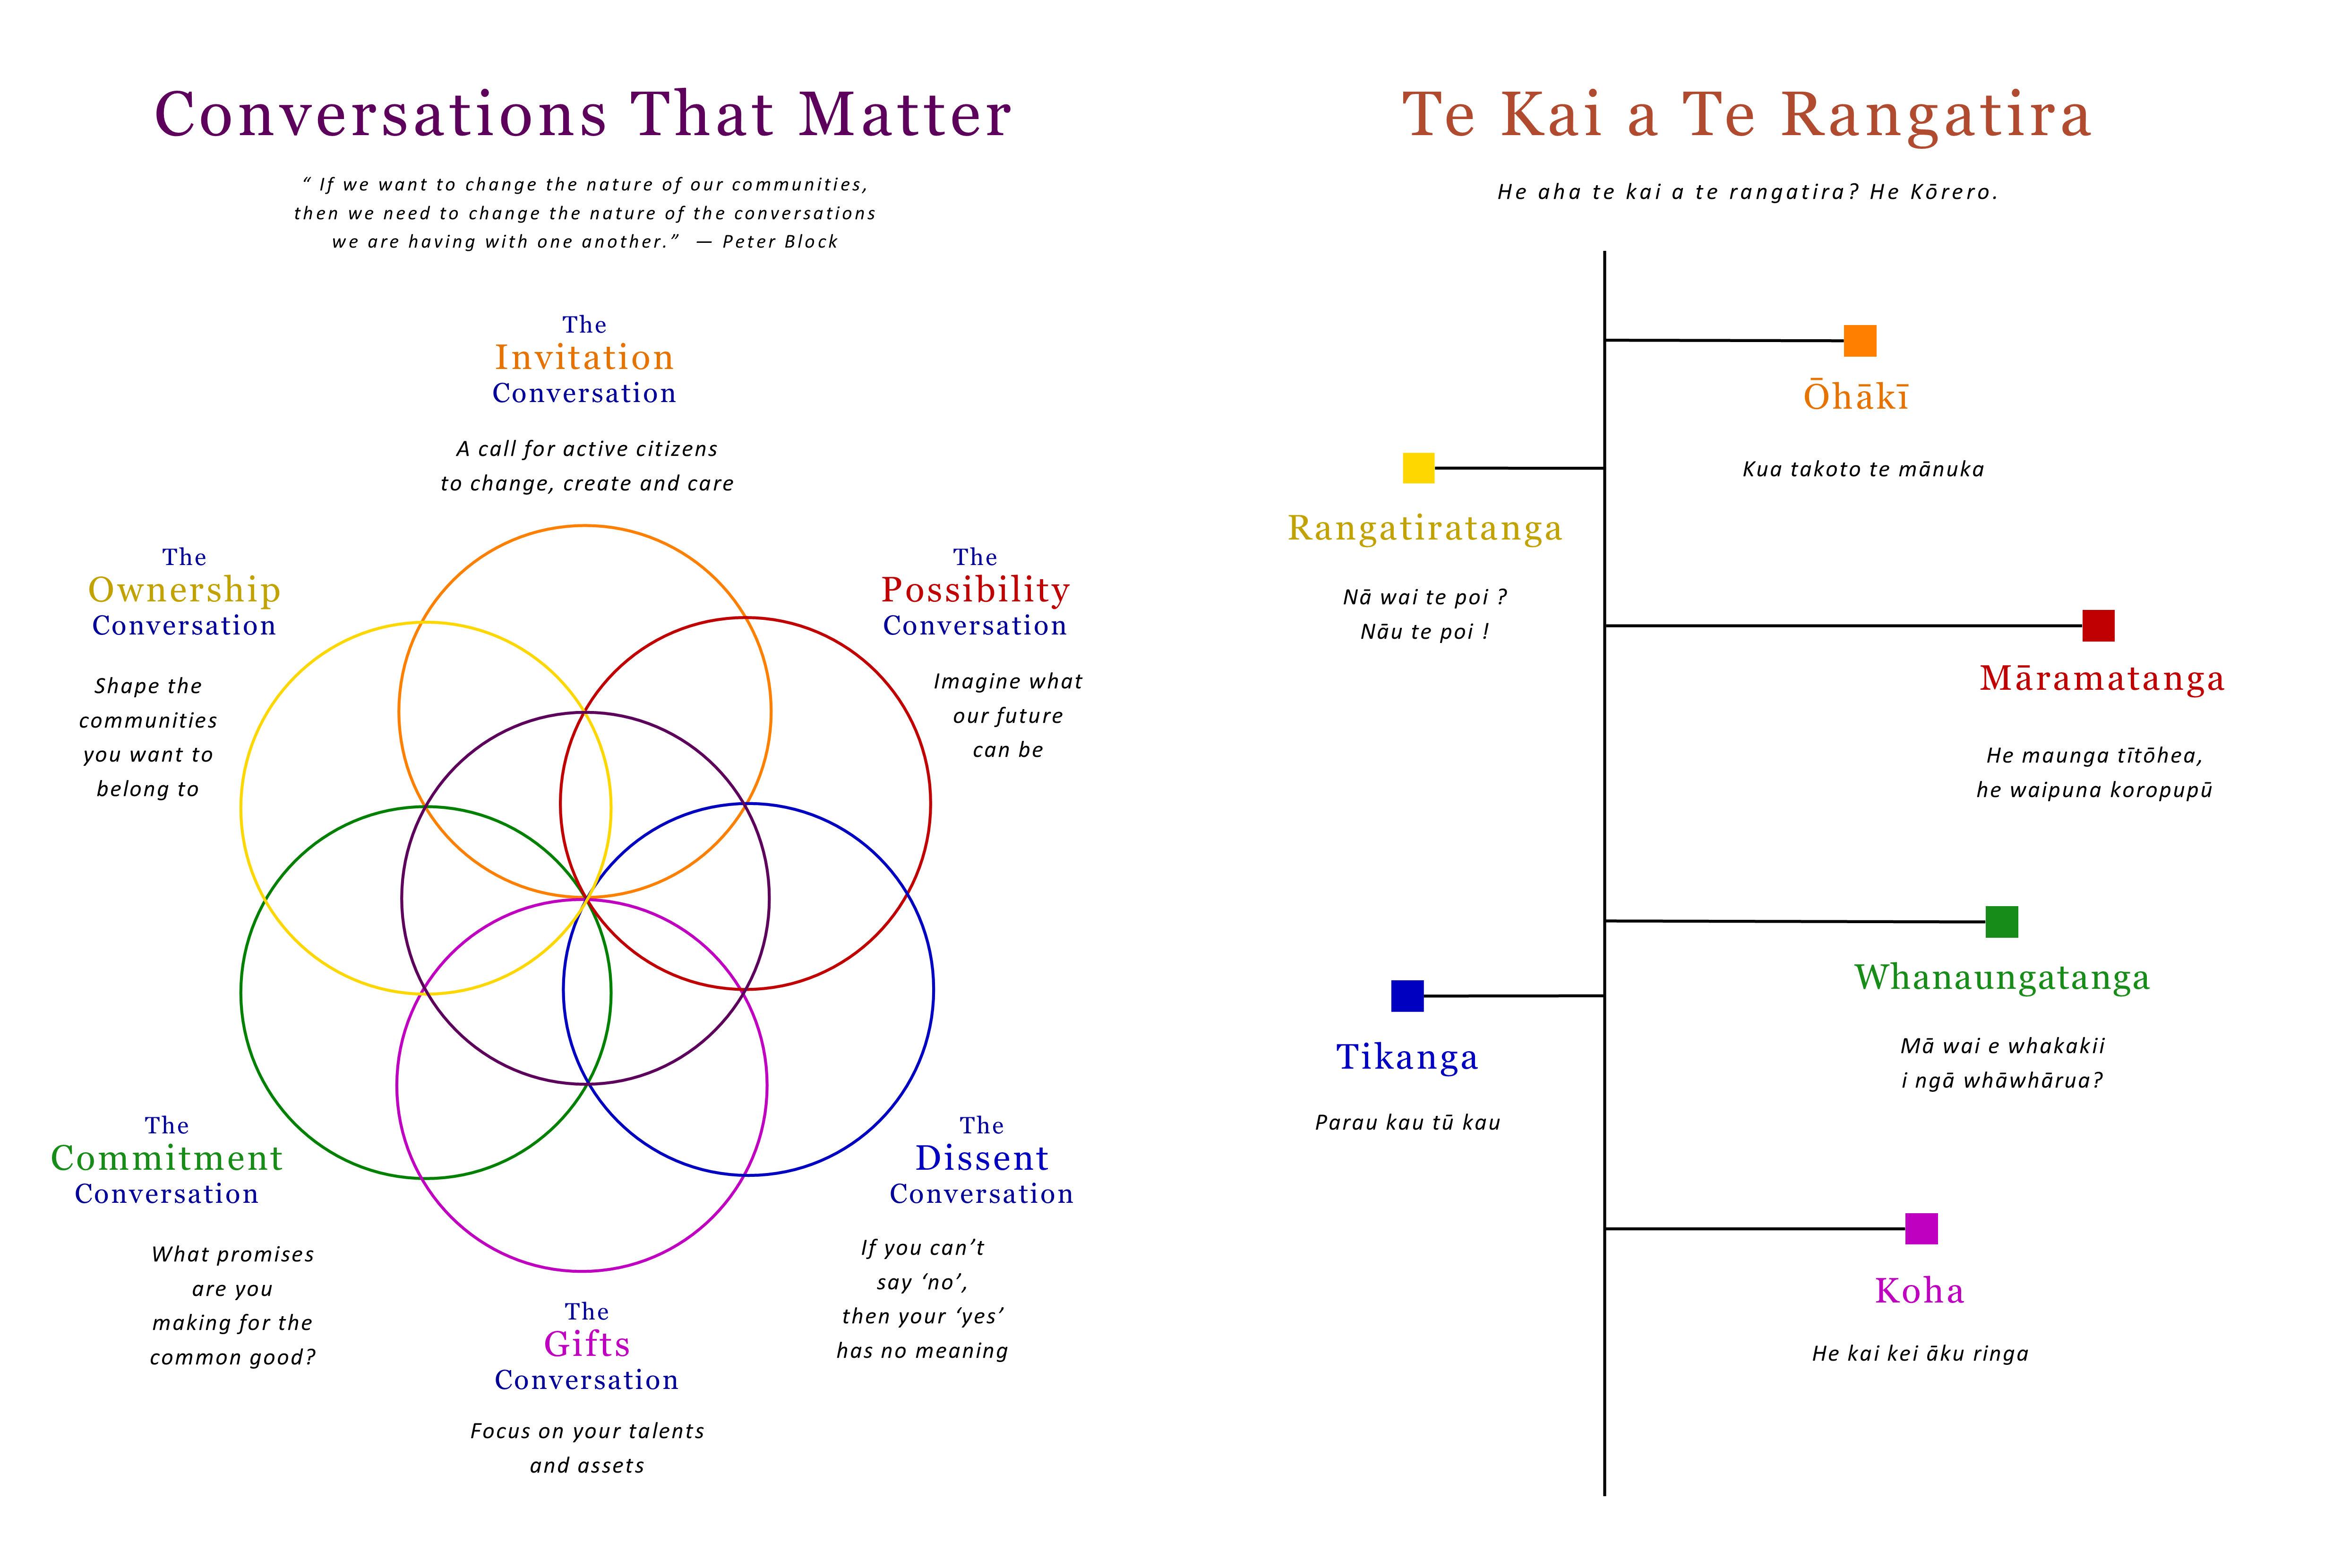 ConversationsKai.png